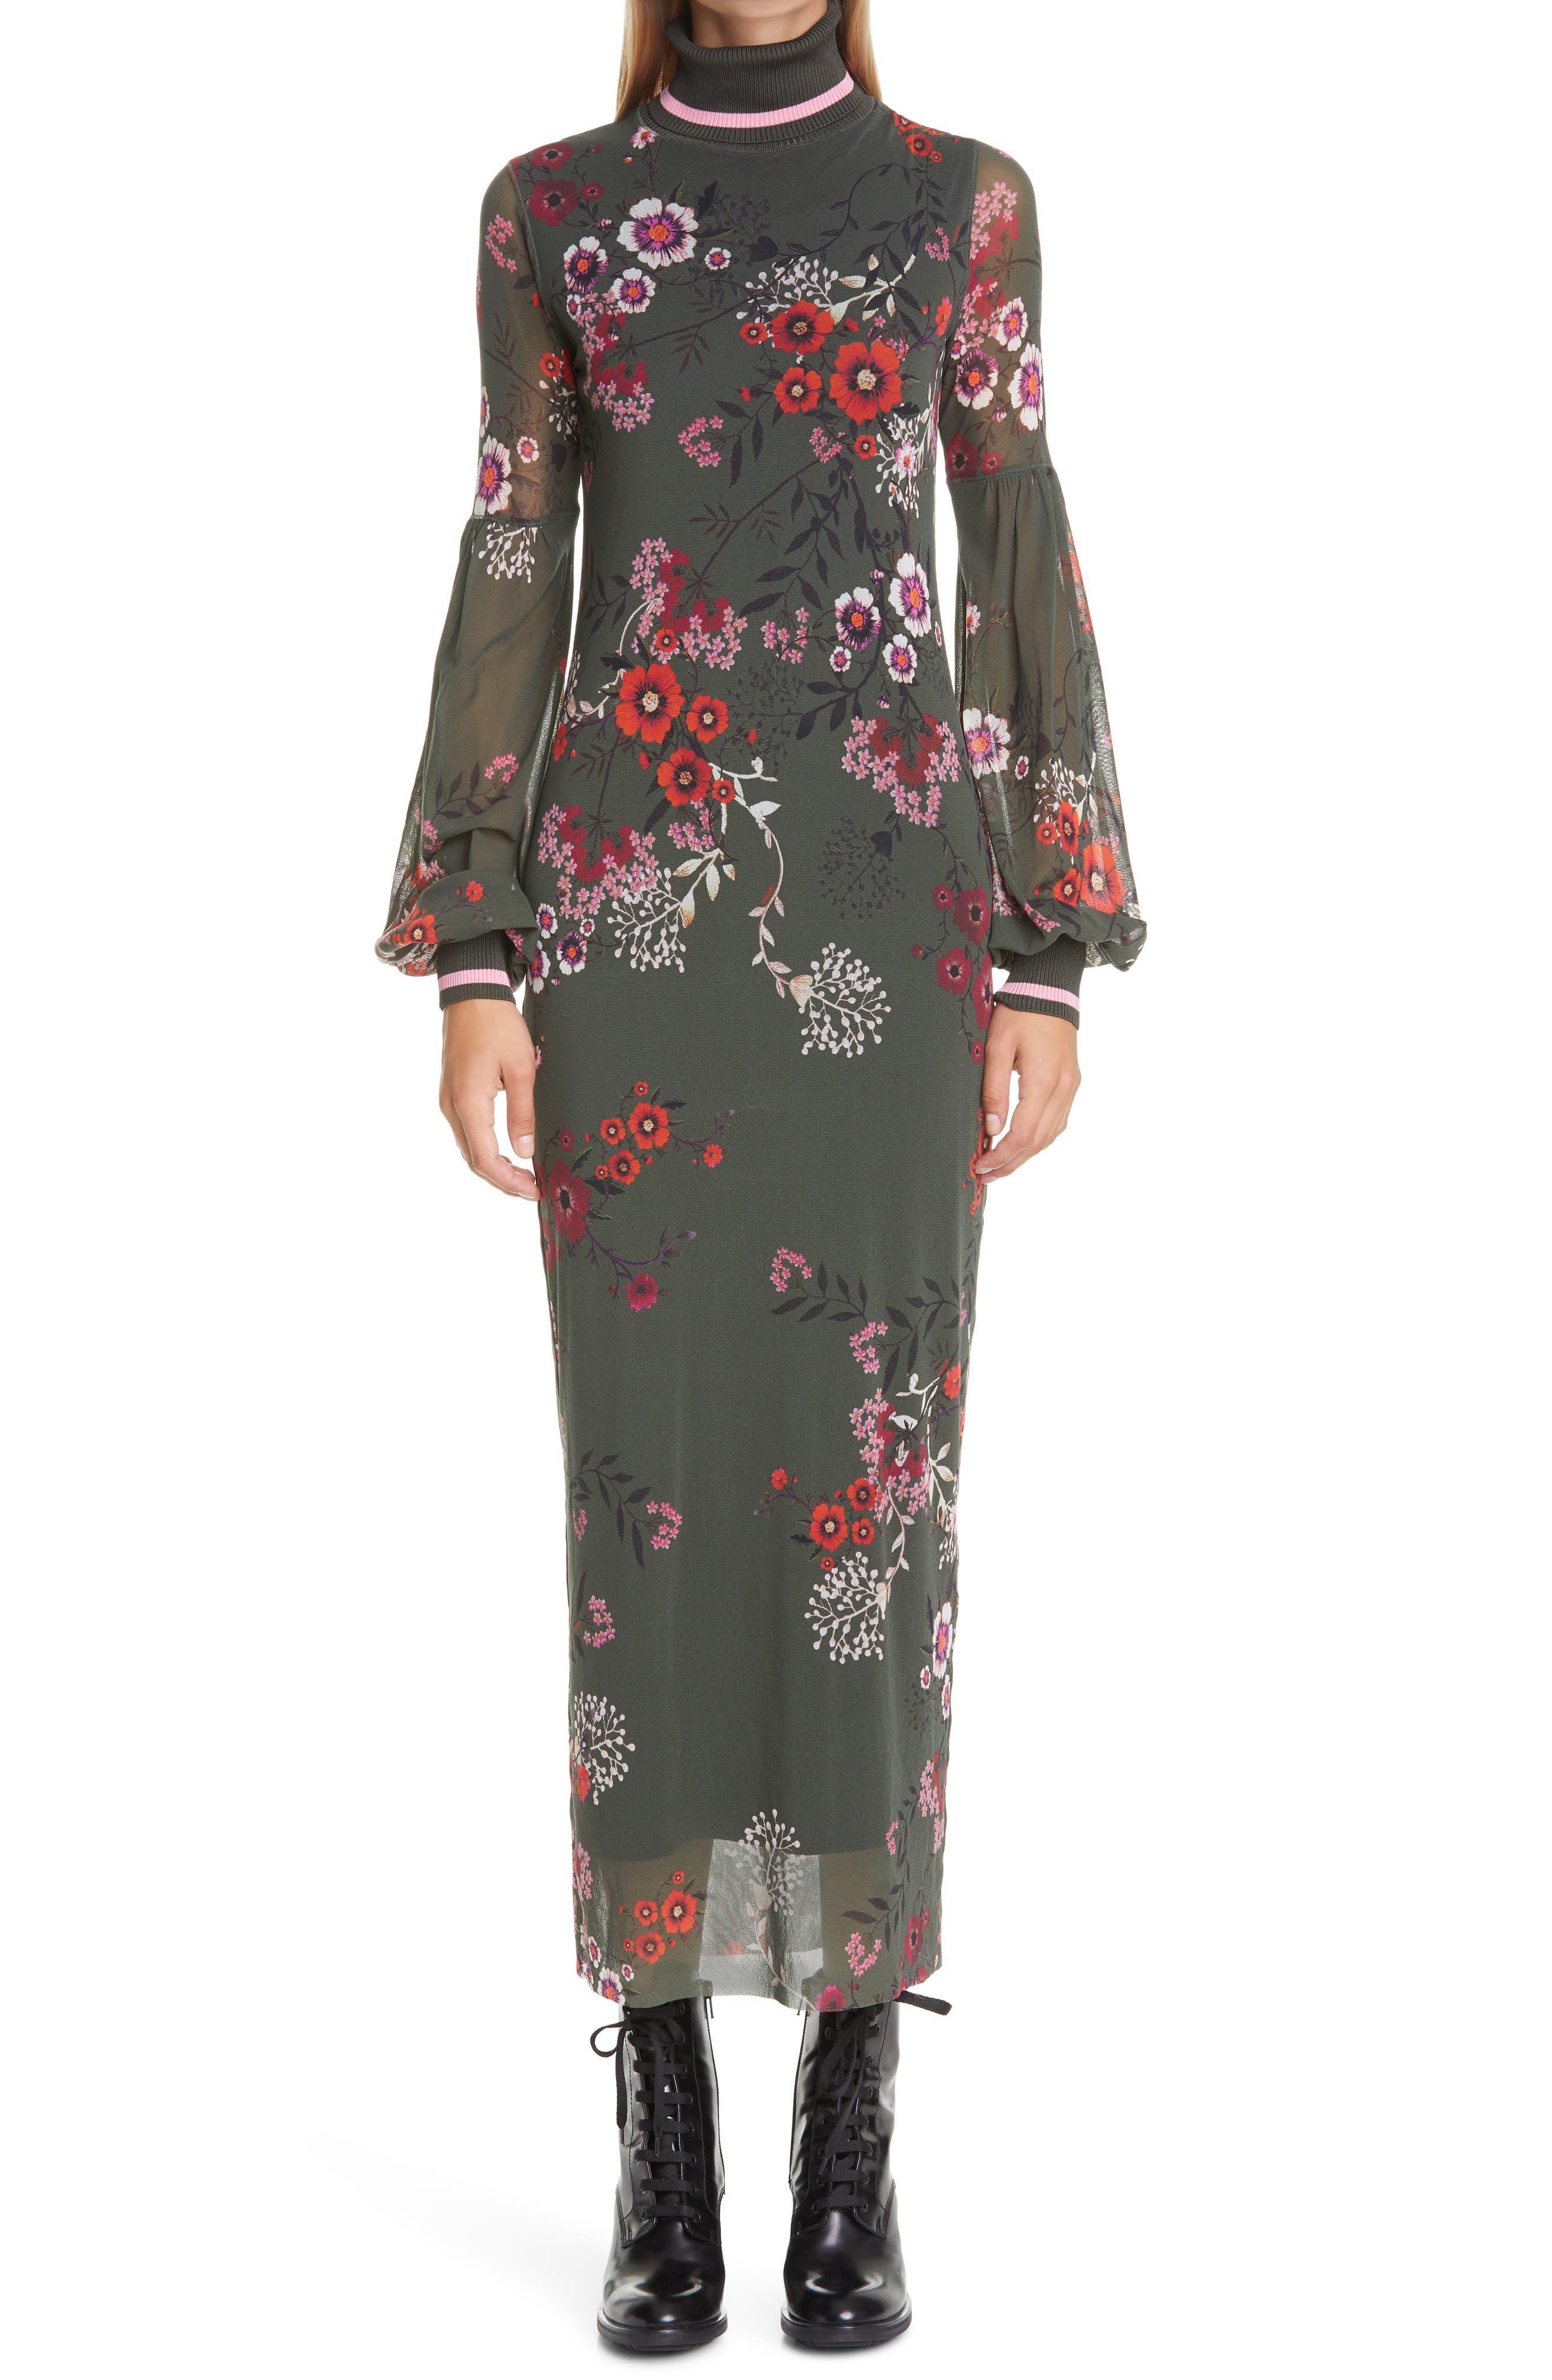 Botanical Print Long Sleeve Turtleneck Dress